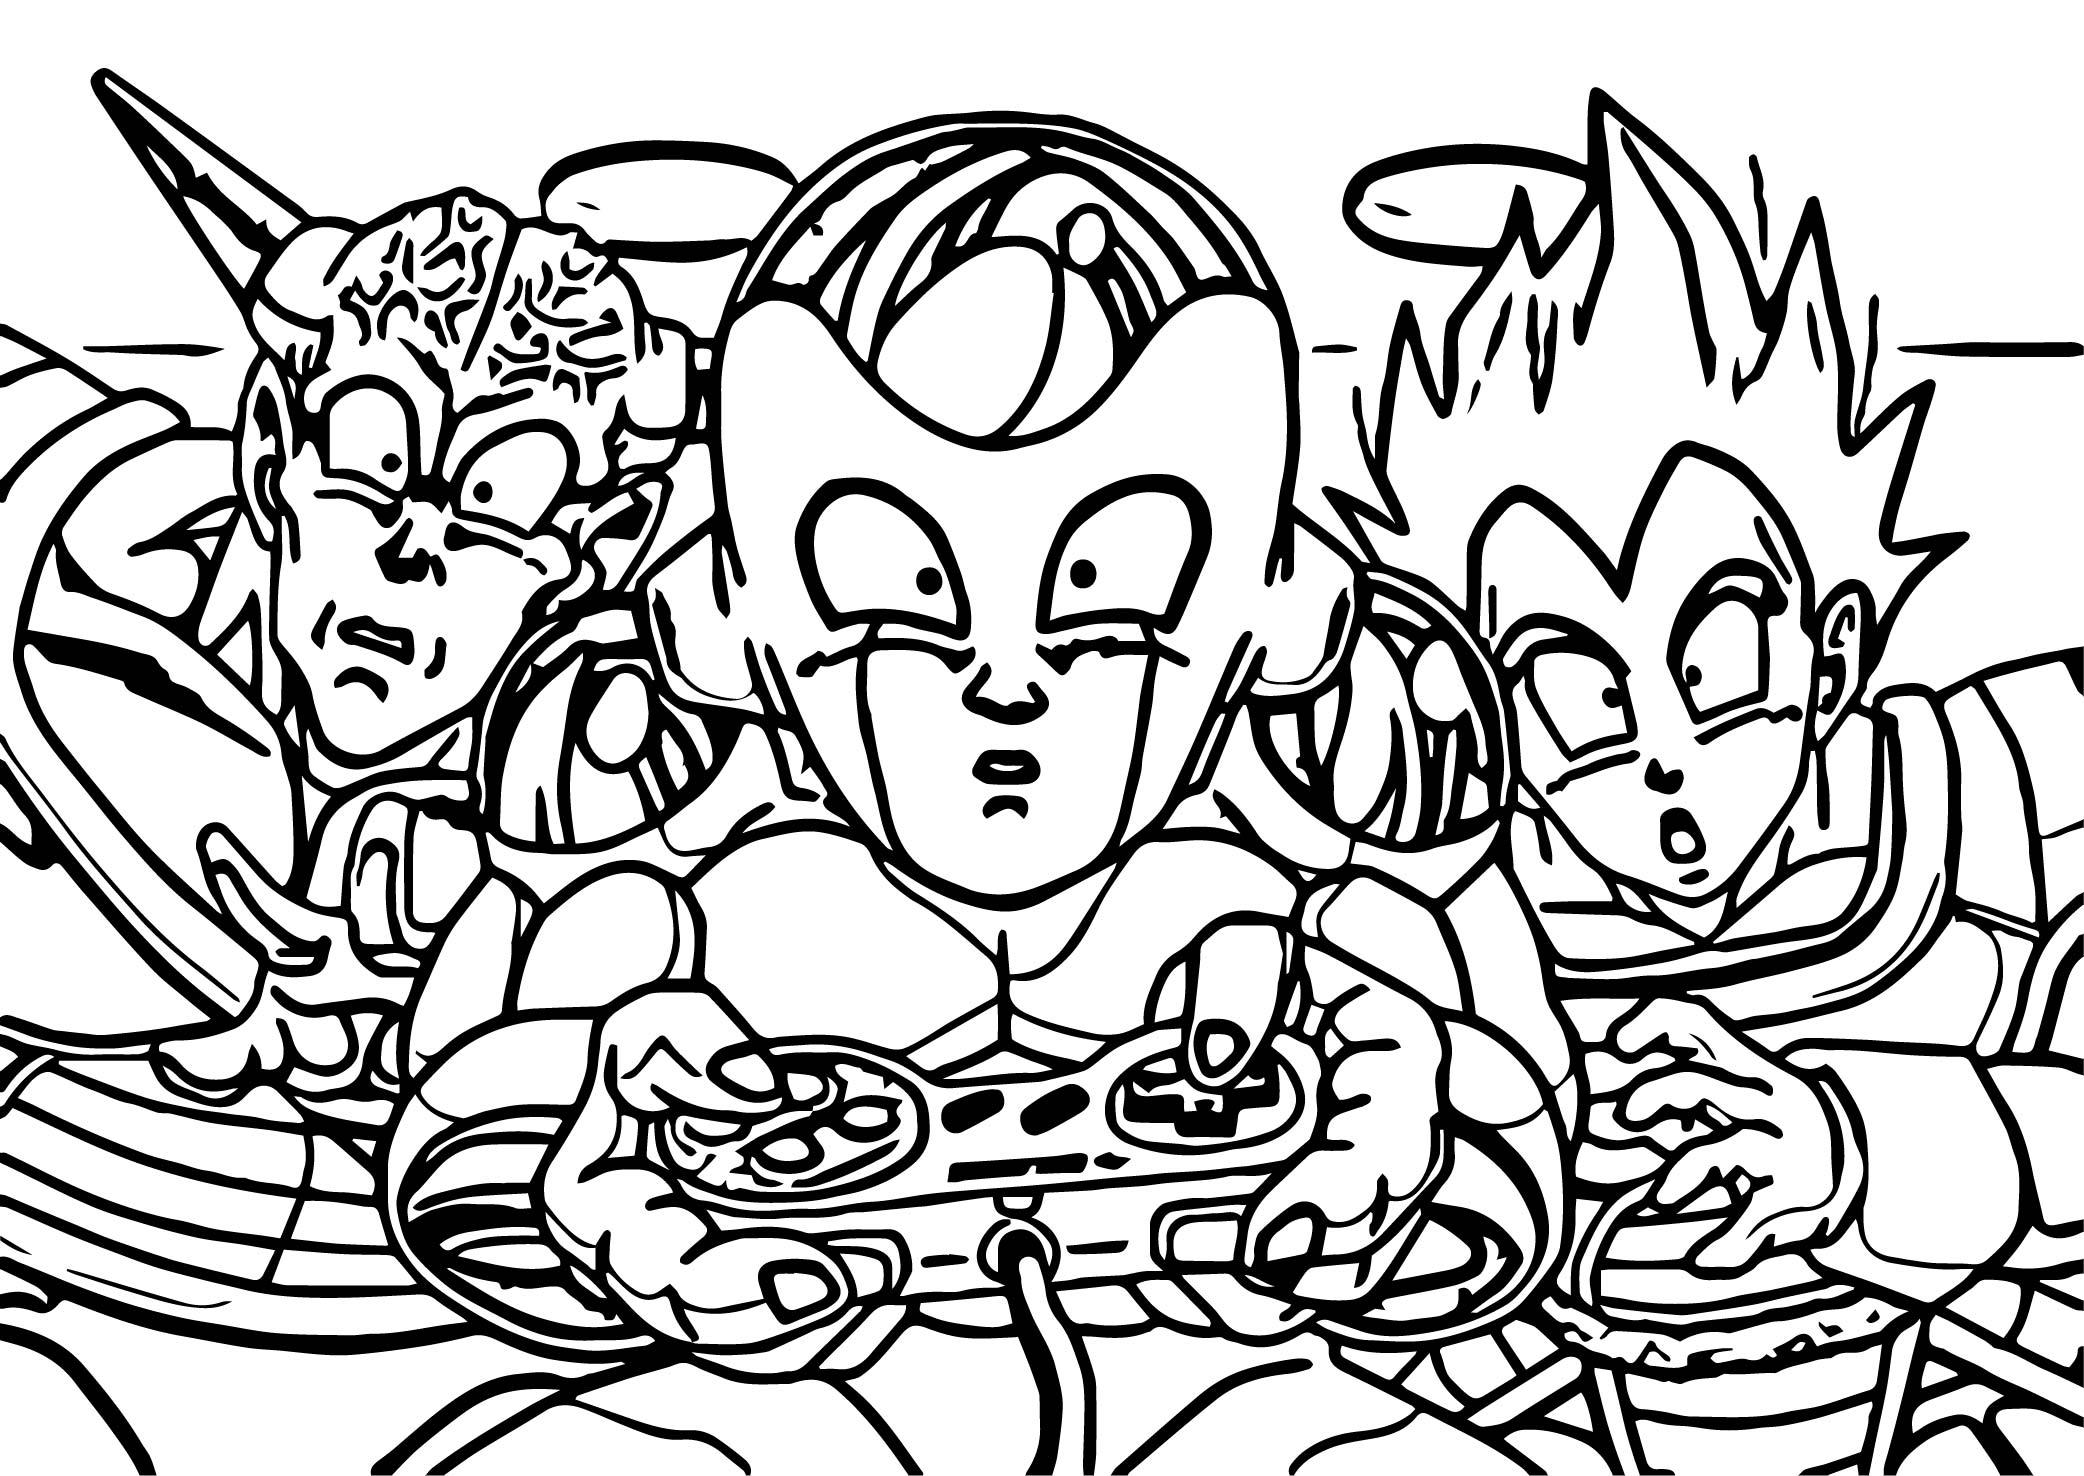 2084x1476 Cartoon Comic Dragonball Z Controller Super Nintendo Coloring Page